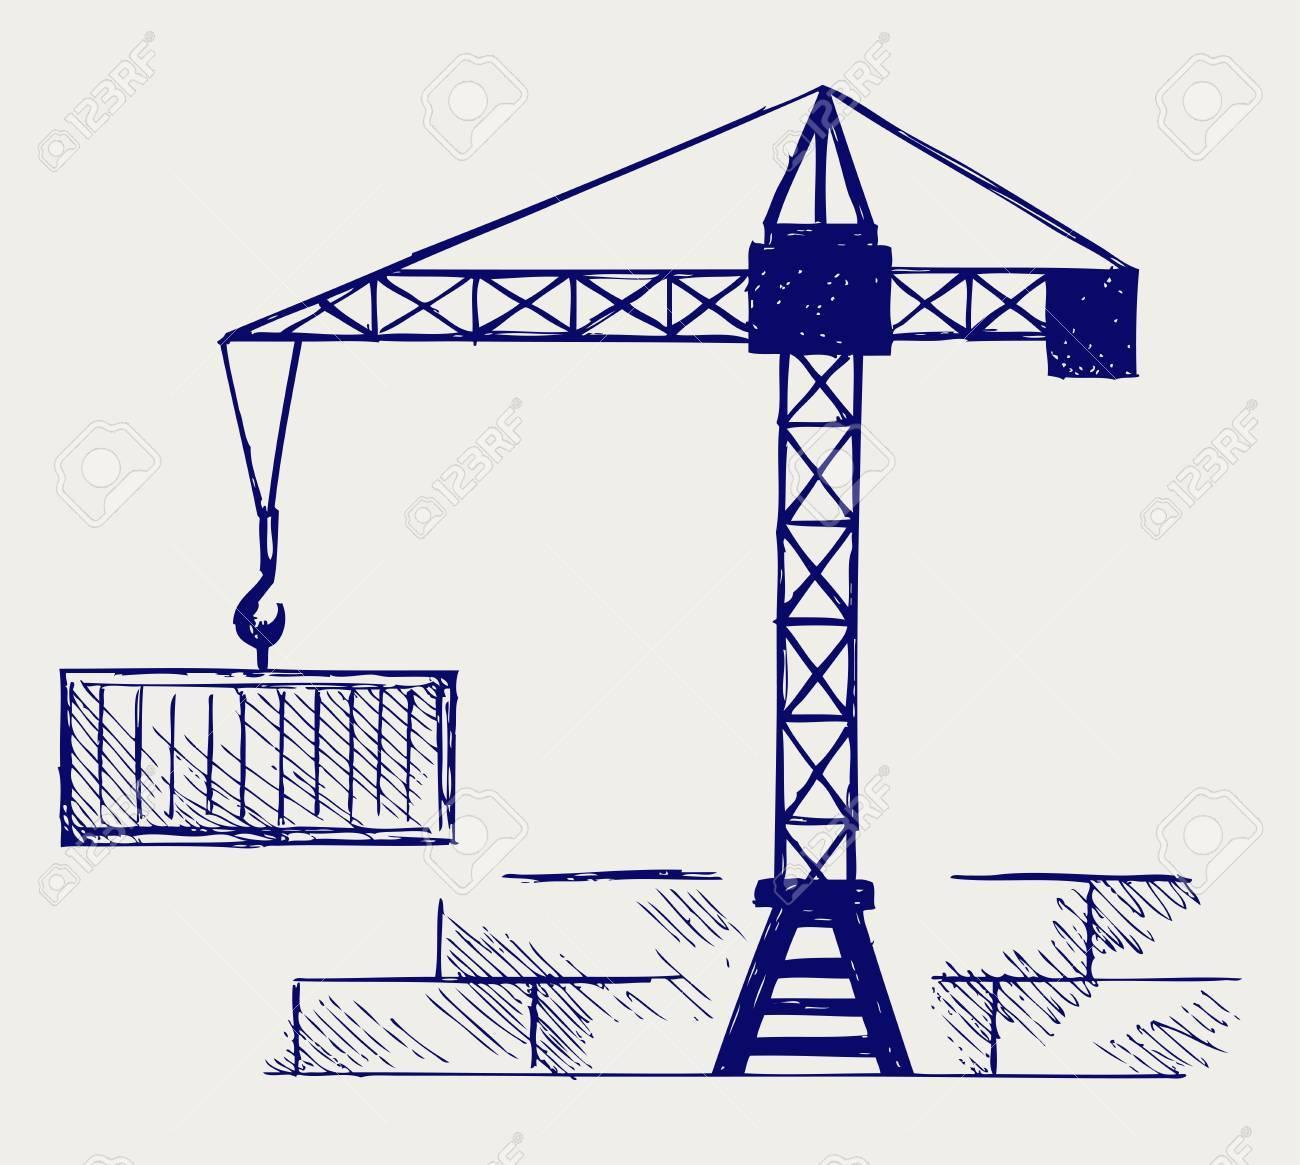 Crane working  Doodle style Stock Vector - 16907876